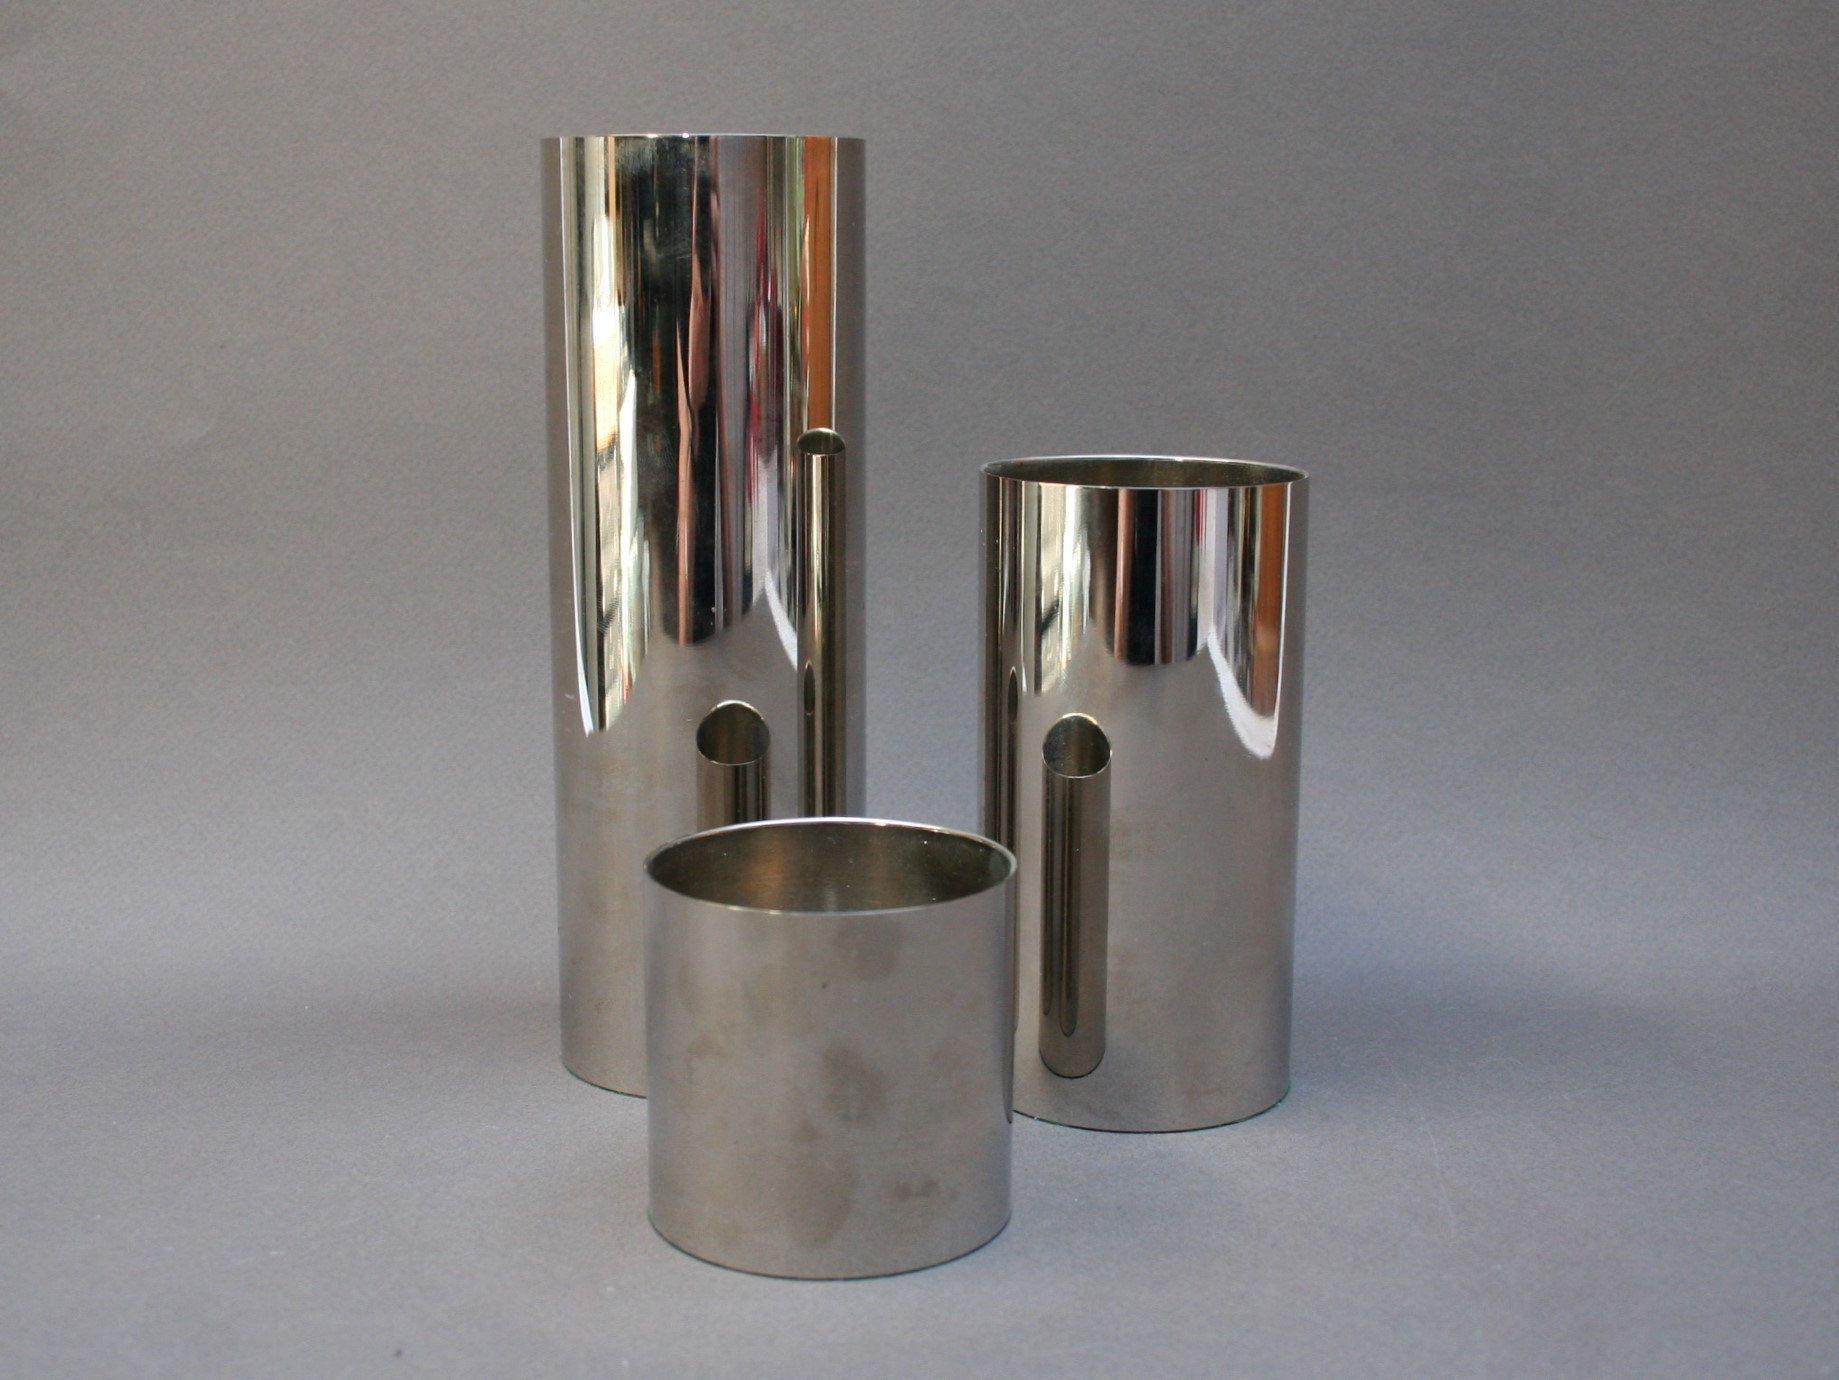 Vintage 1970s Danish Graduated Candleholders Set Of Modernist Stainless Steel Scandinavian Candlestick Holders For Votive Candles Candlesticks Candle Holders Metal Candle Holders